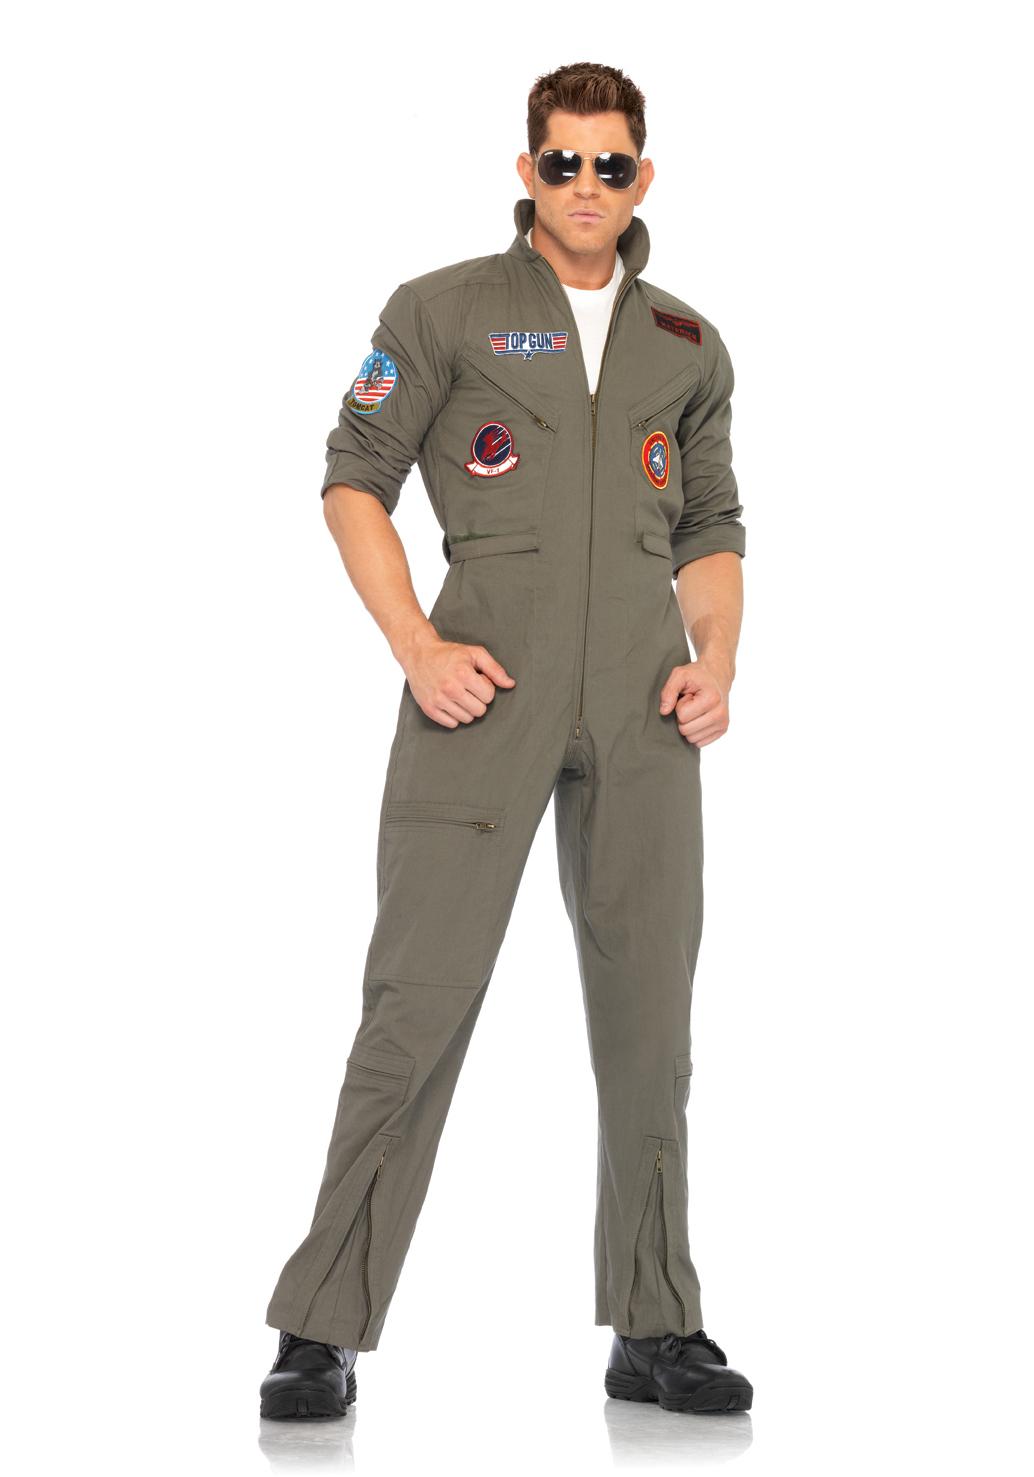 Leg Avenue TG83702 Top Gun Men's Flight Suit | eBay